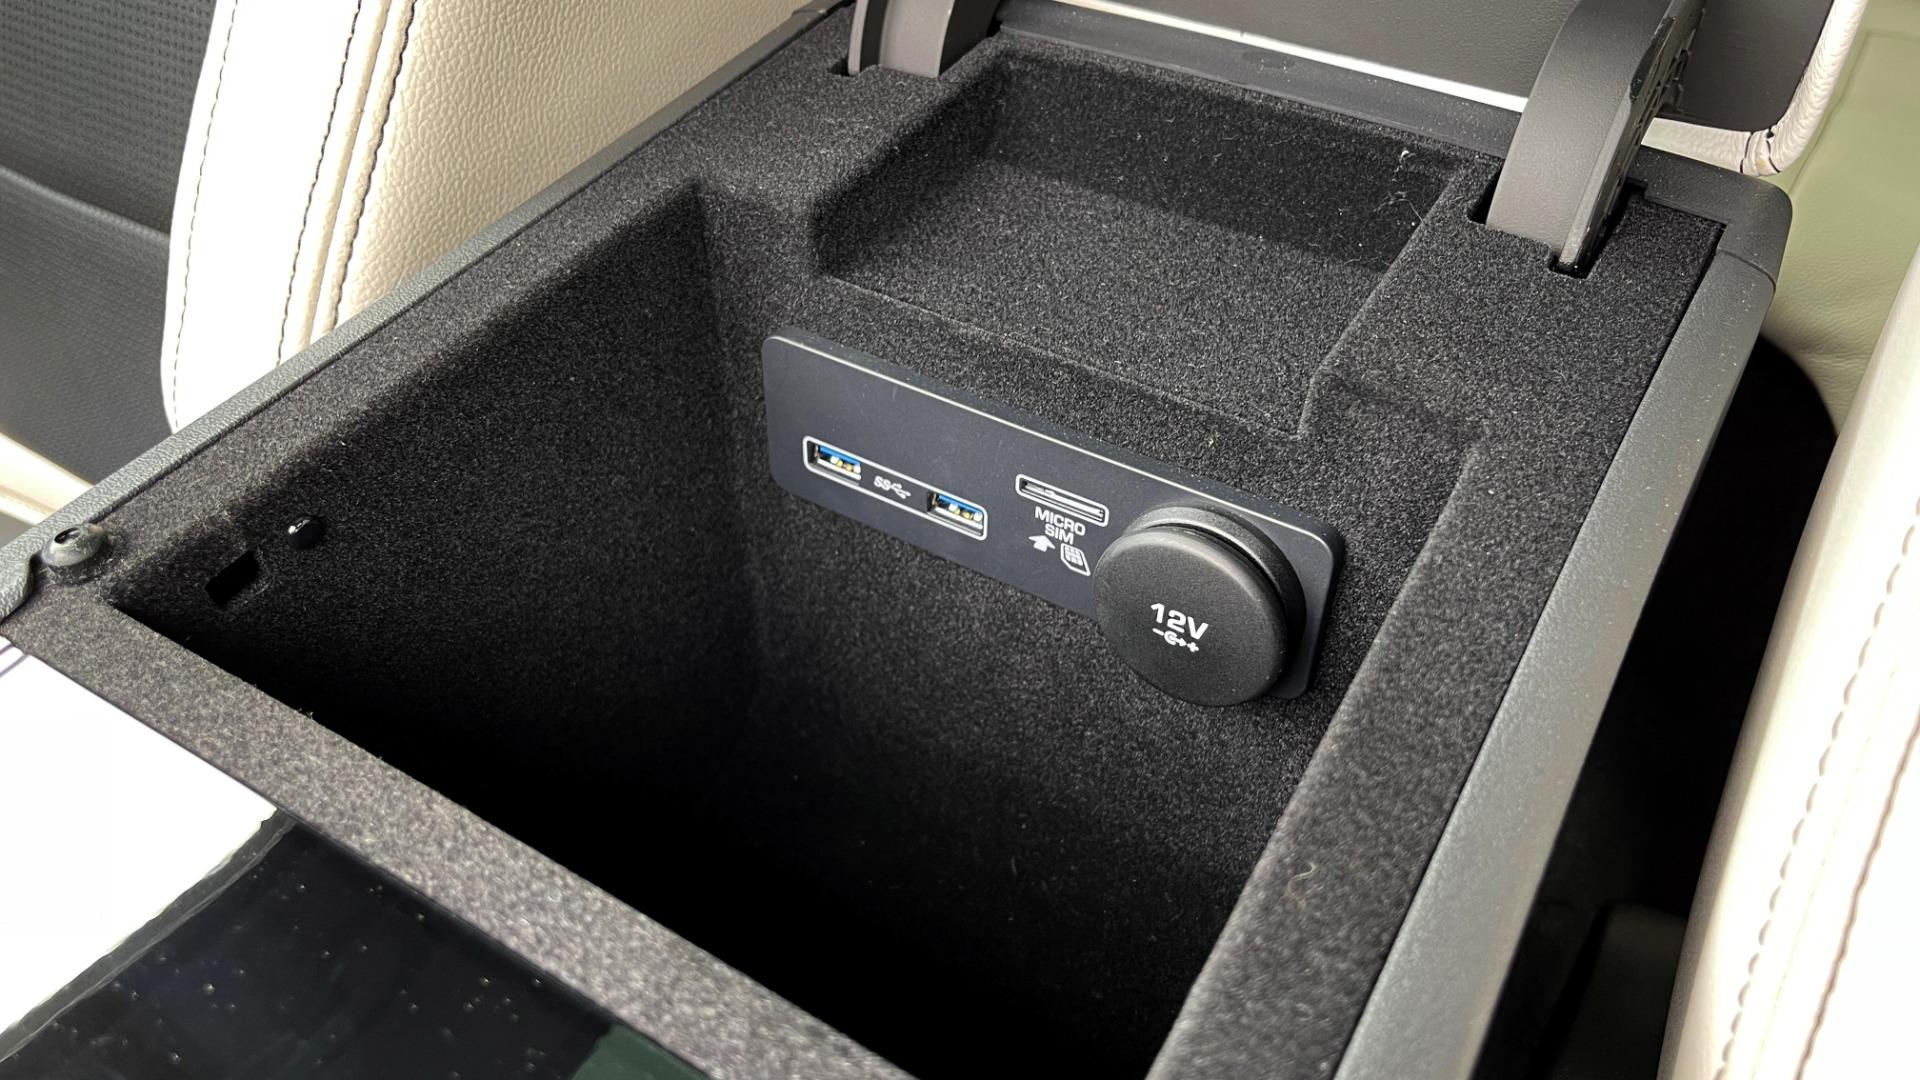 Used 2019 Jaguar F-PACE S / DRIVE PKG / BSA / HUD / BLACK EXT PKG / REARVIEW for sale $50,995 at Formula Imports in Charlotte NC 28227 44